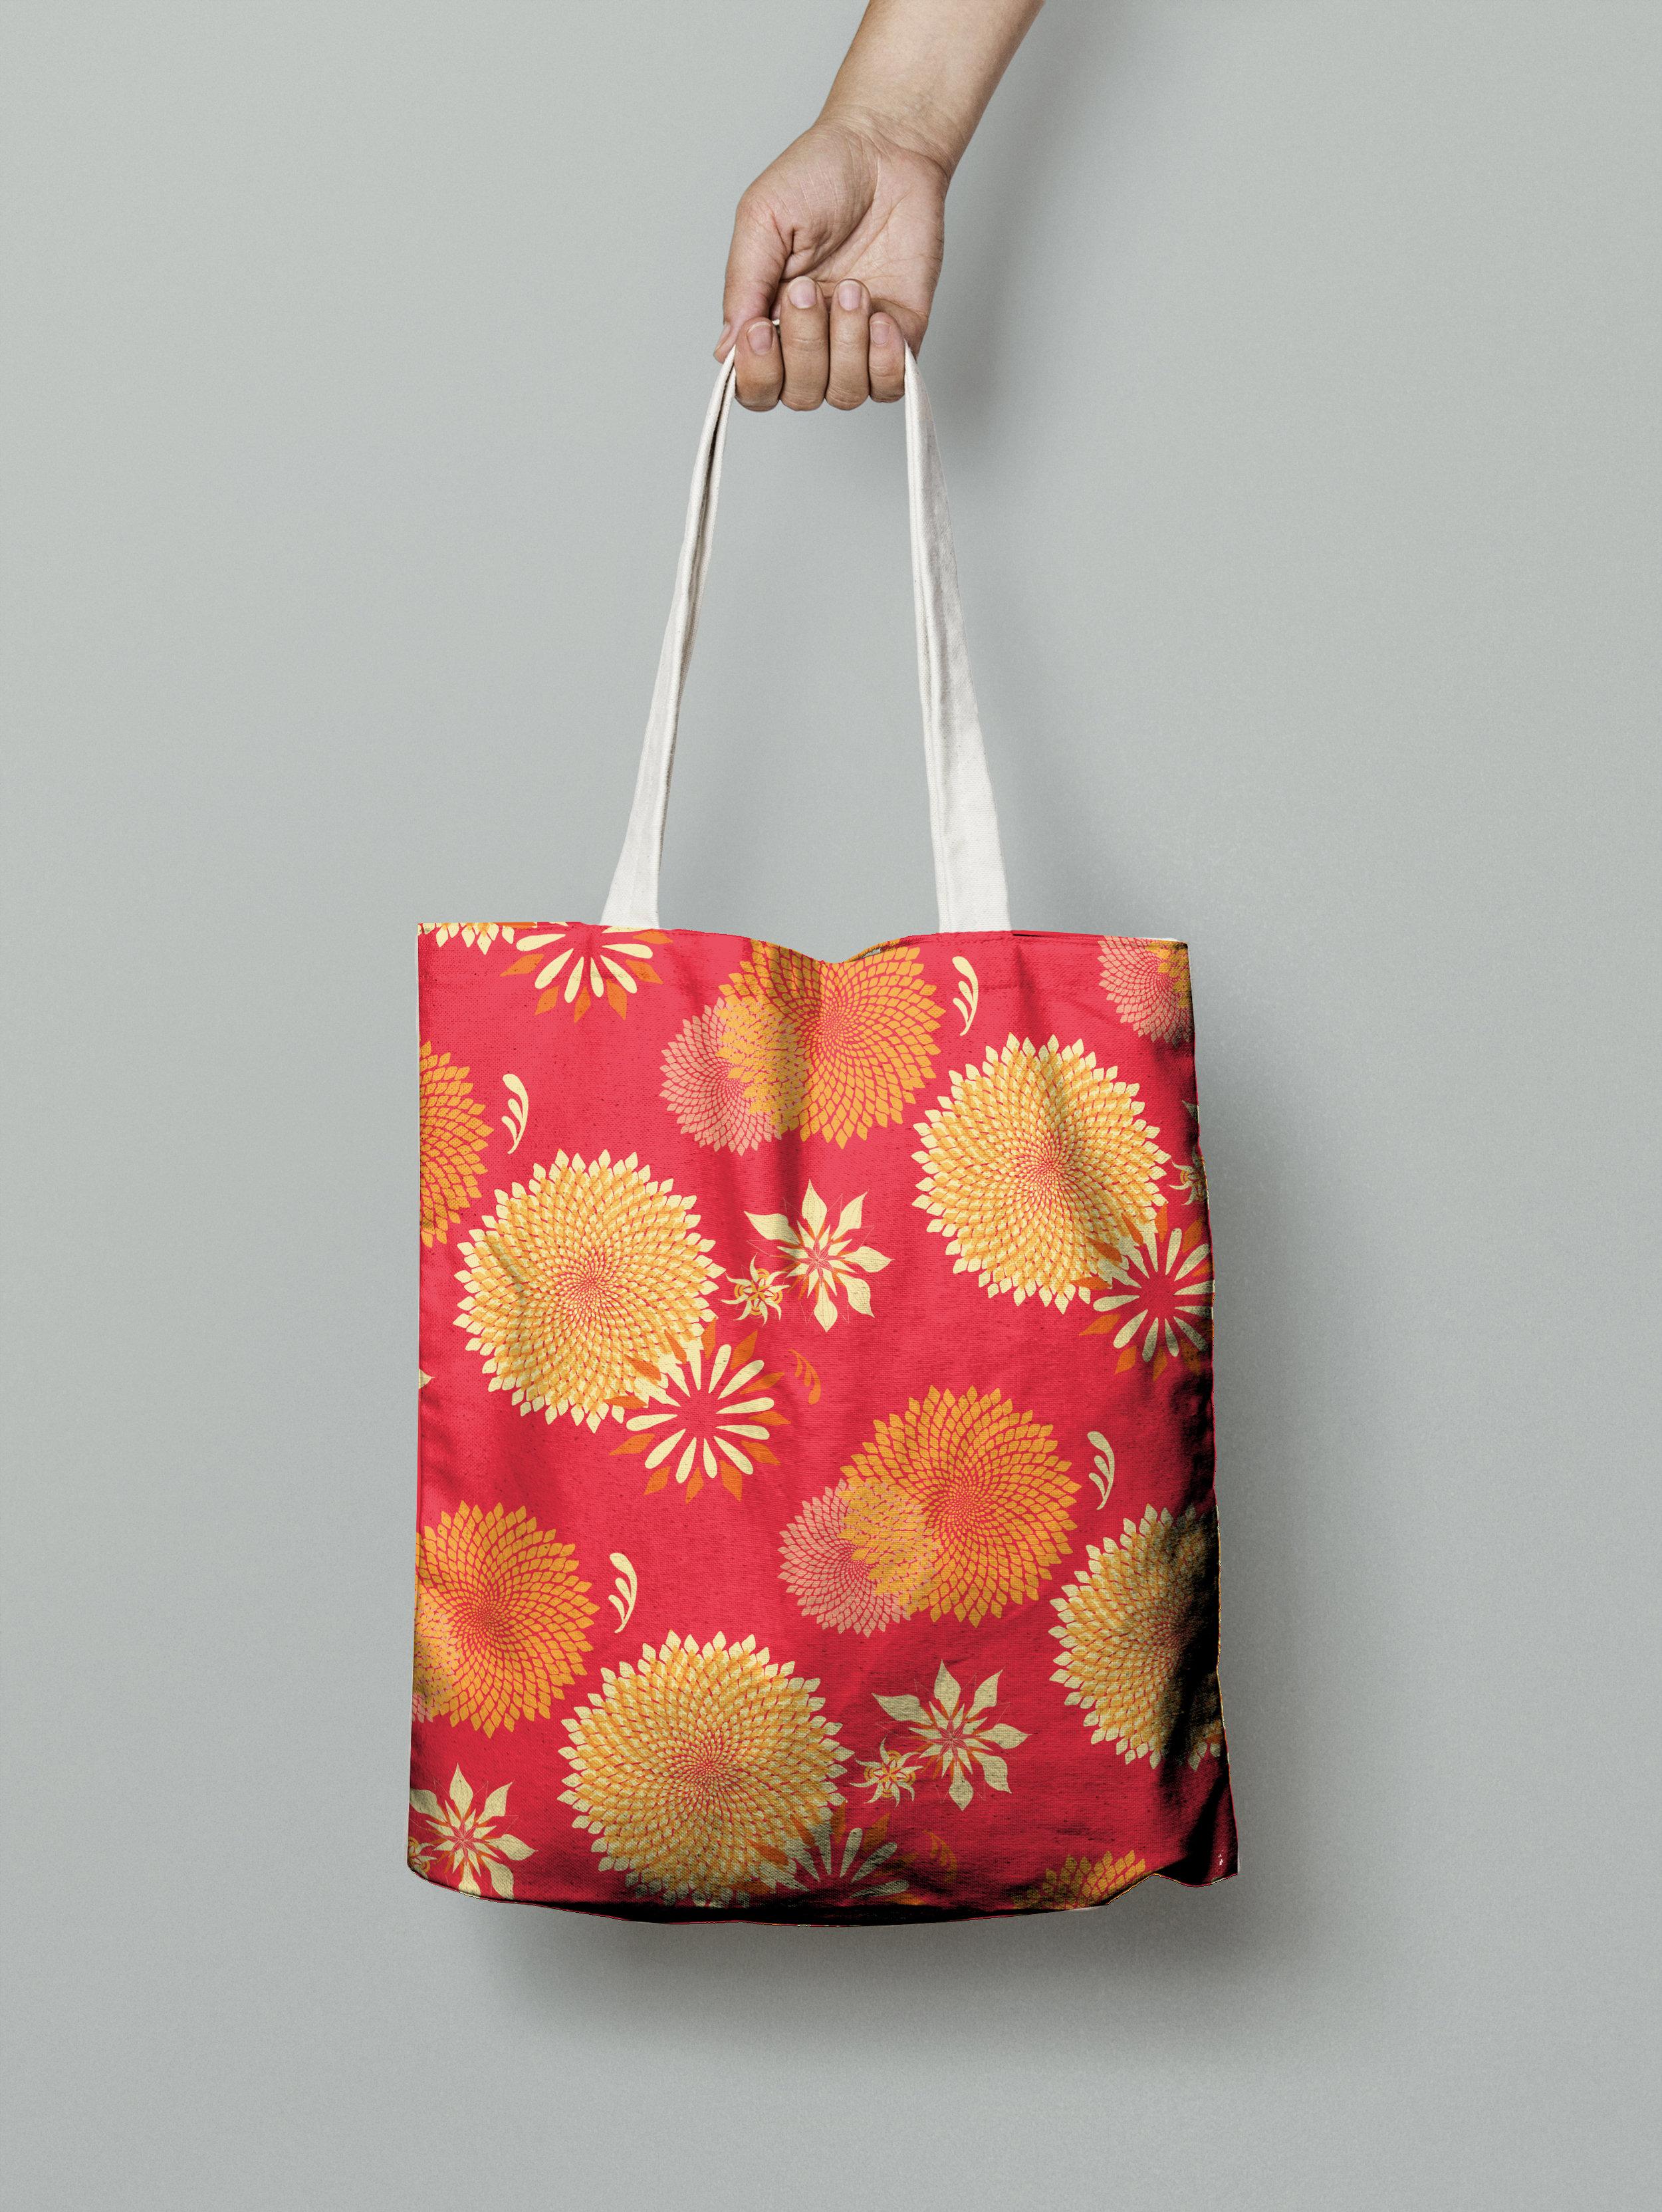 sunflowerTote Bag MockUp.jpg